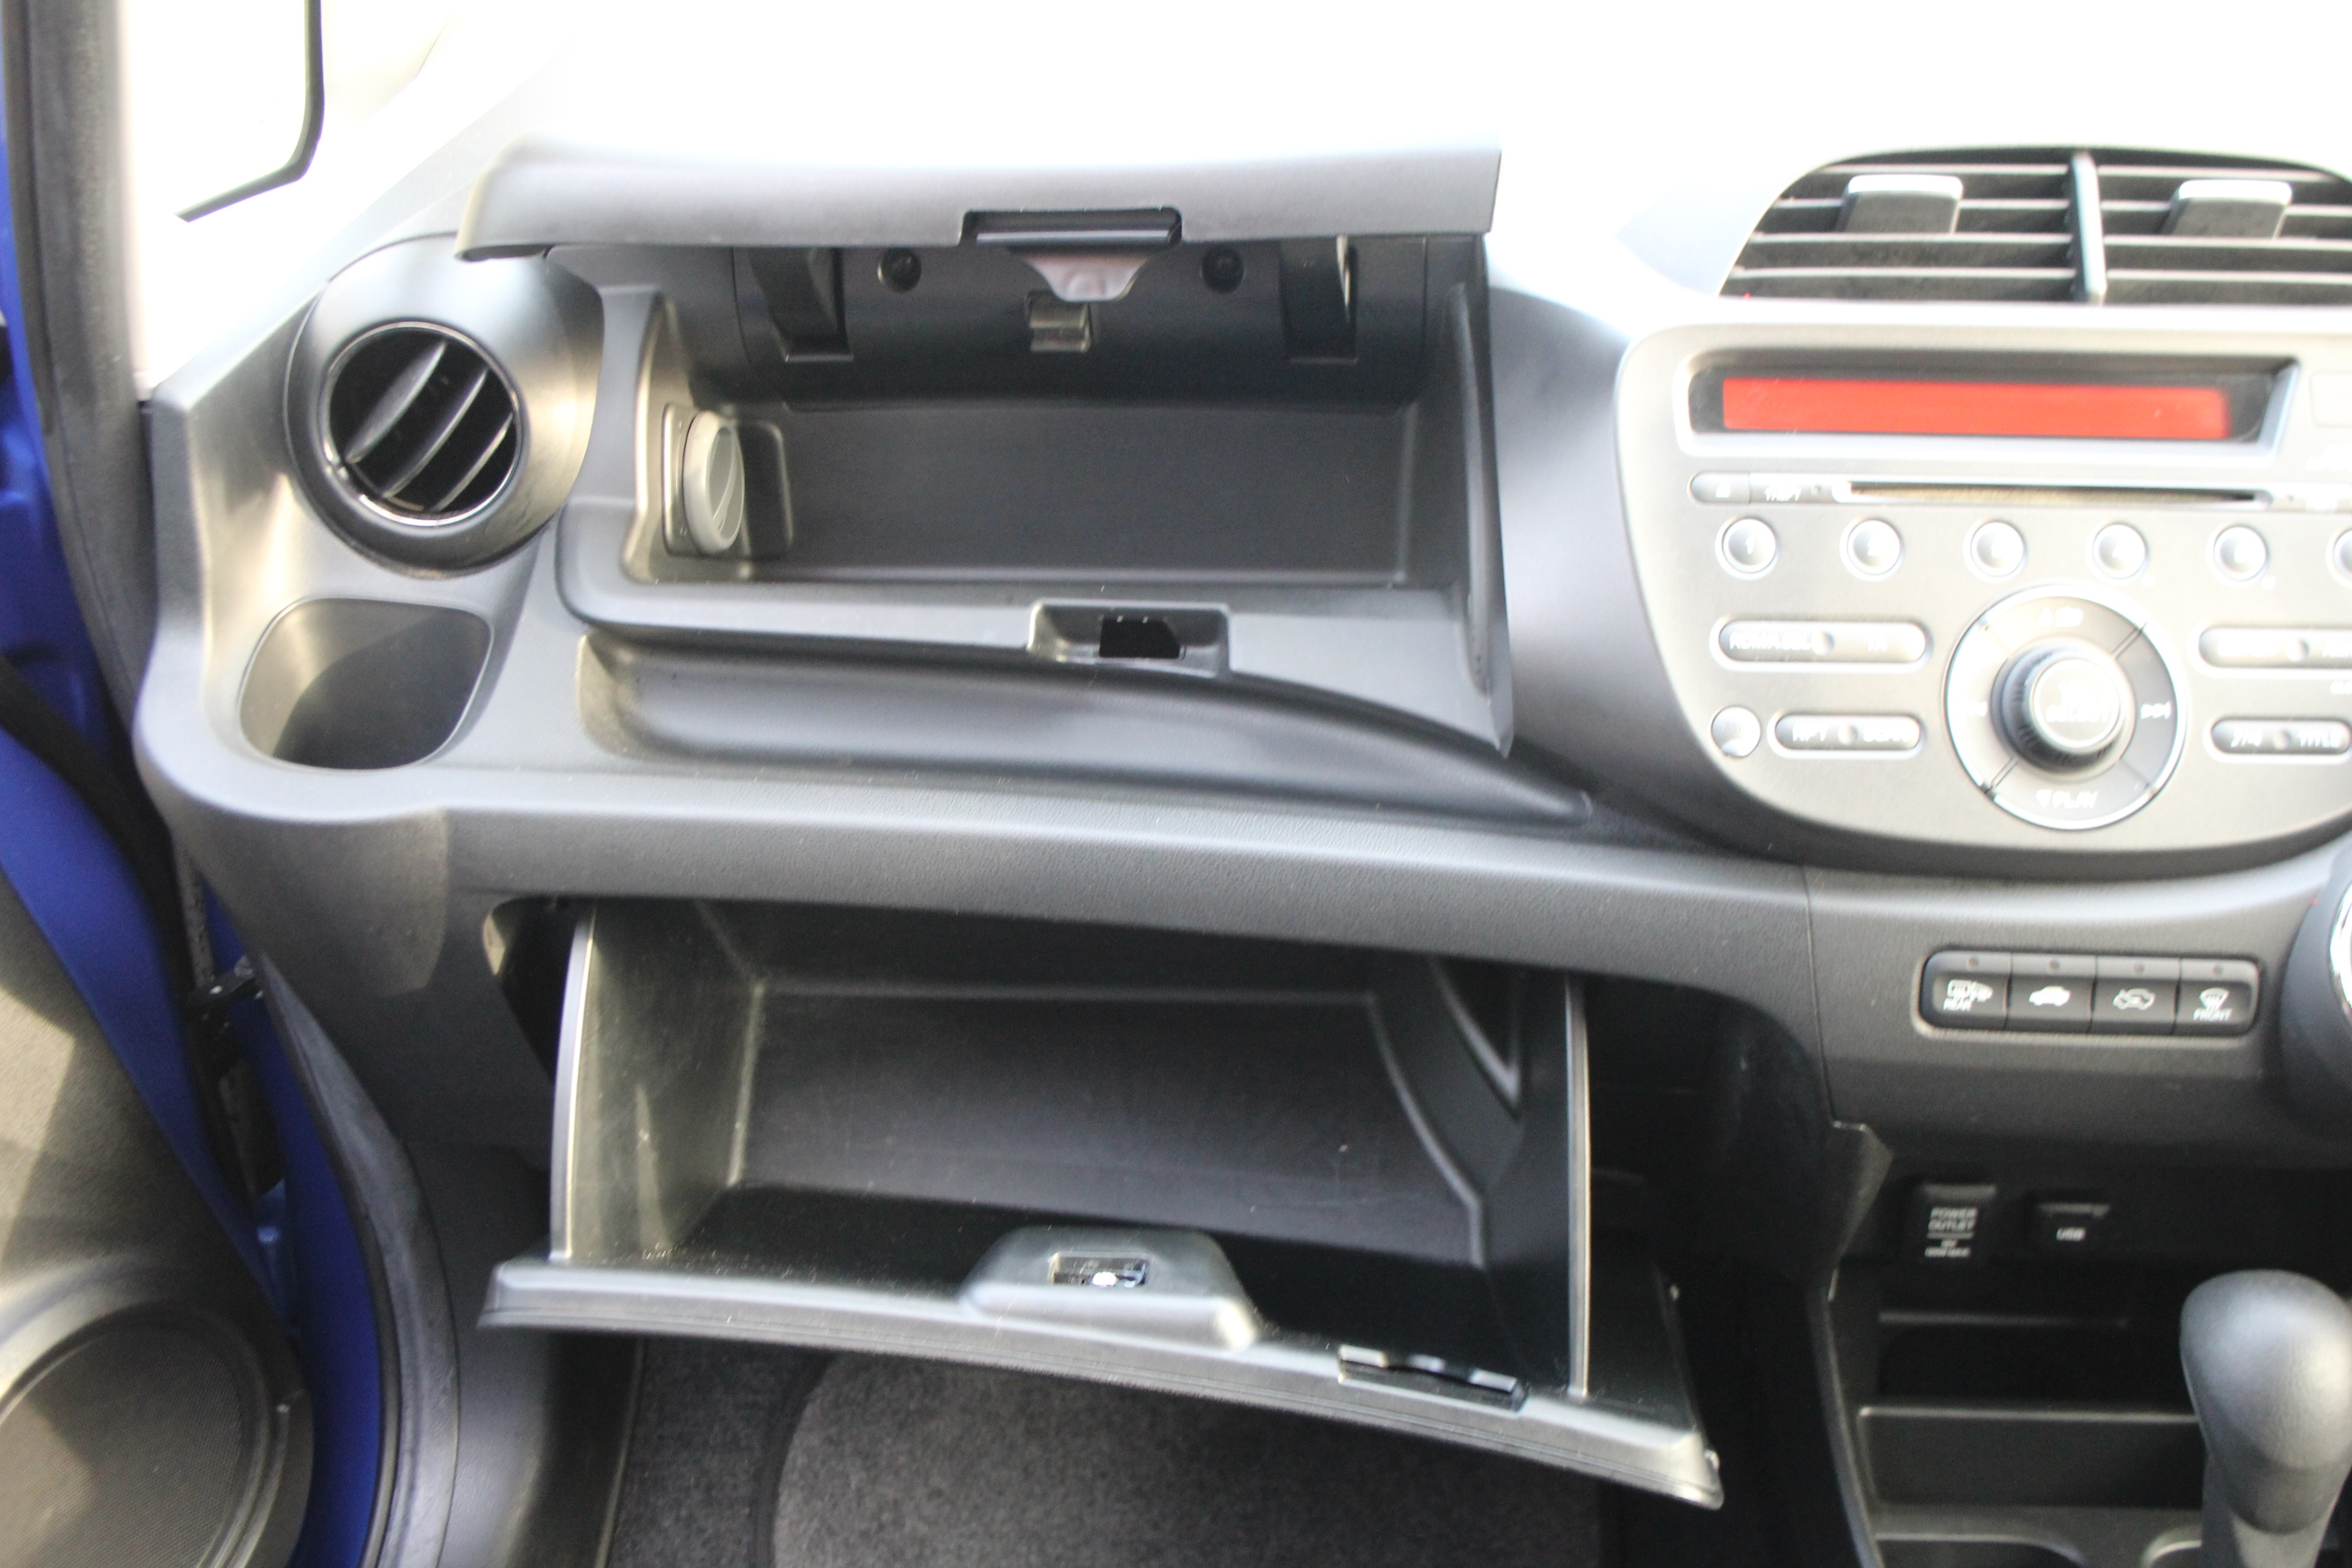 Lot 317 - A HONDA JAZZ FIVE-DOOR HATCHBACK MOTOR CAR in metallic blue, automatic transmission, 1300cc petrol